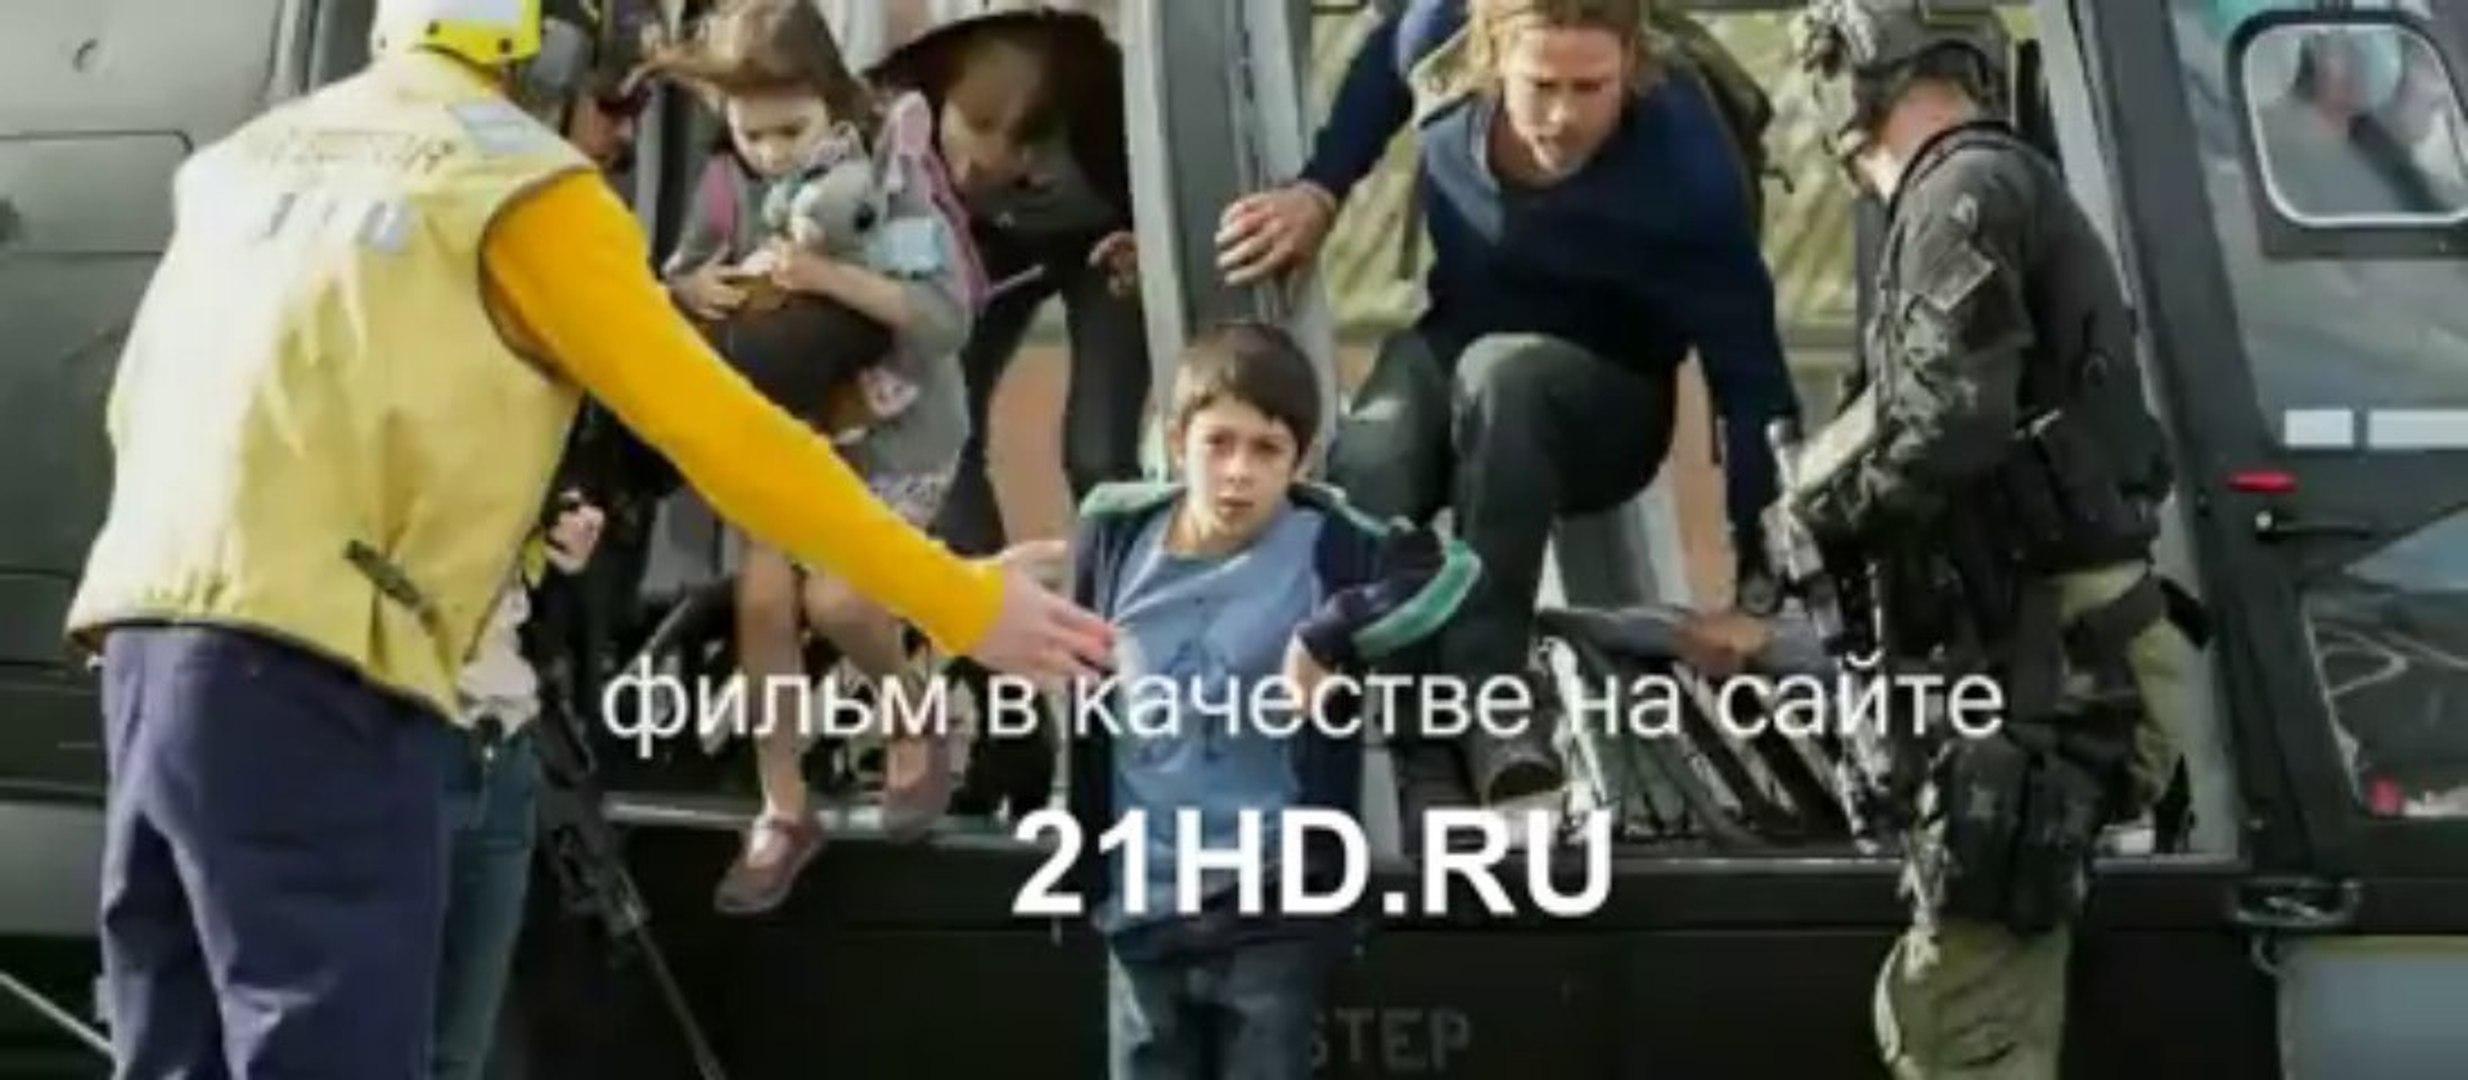 DVD - Война миров Z смотреть онлайн 2013 - to purge the city from the zombie